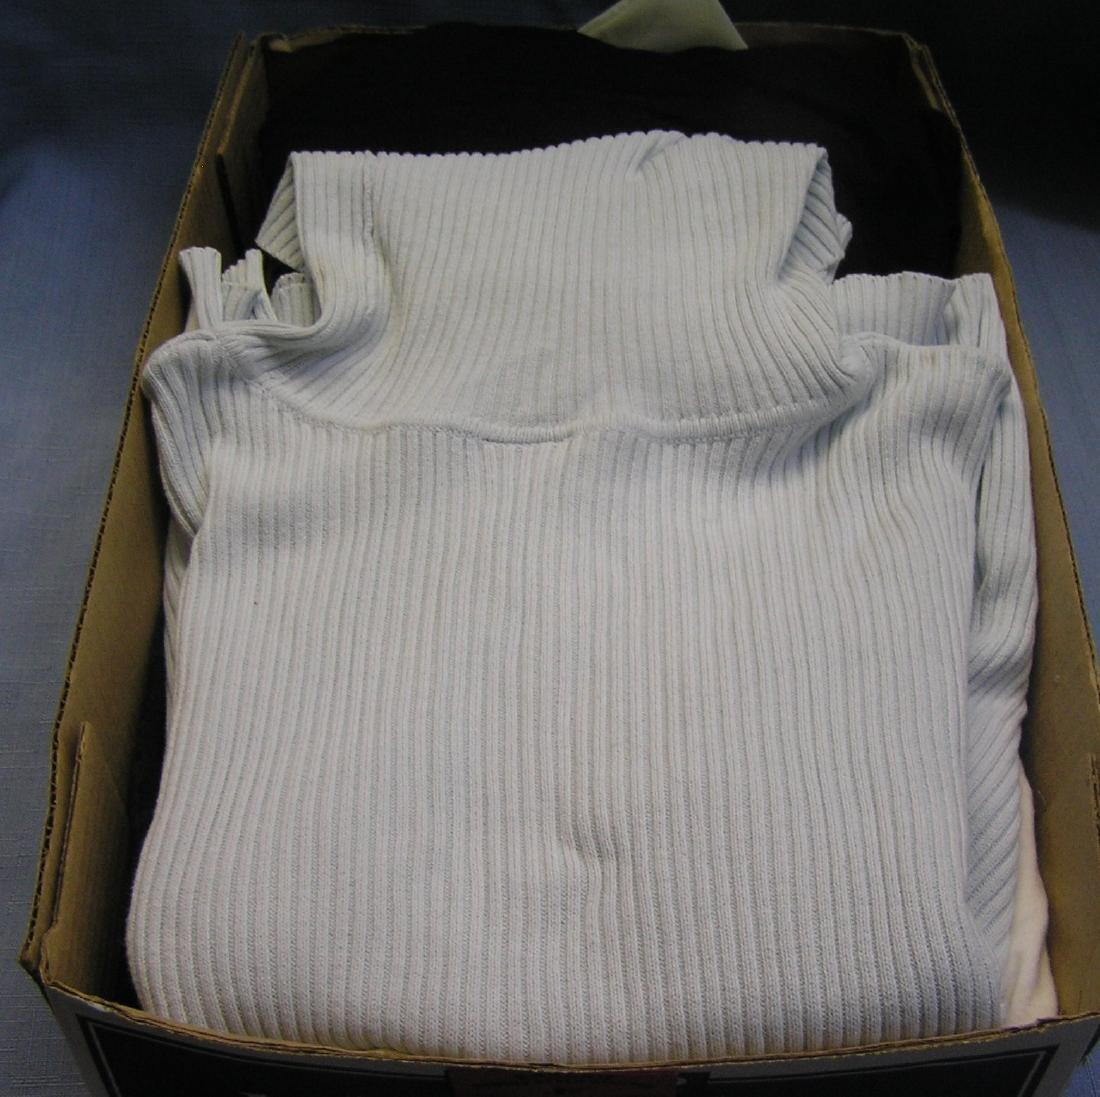 Box of quality modern shirts and turtlenecks